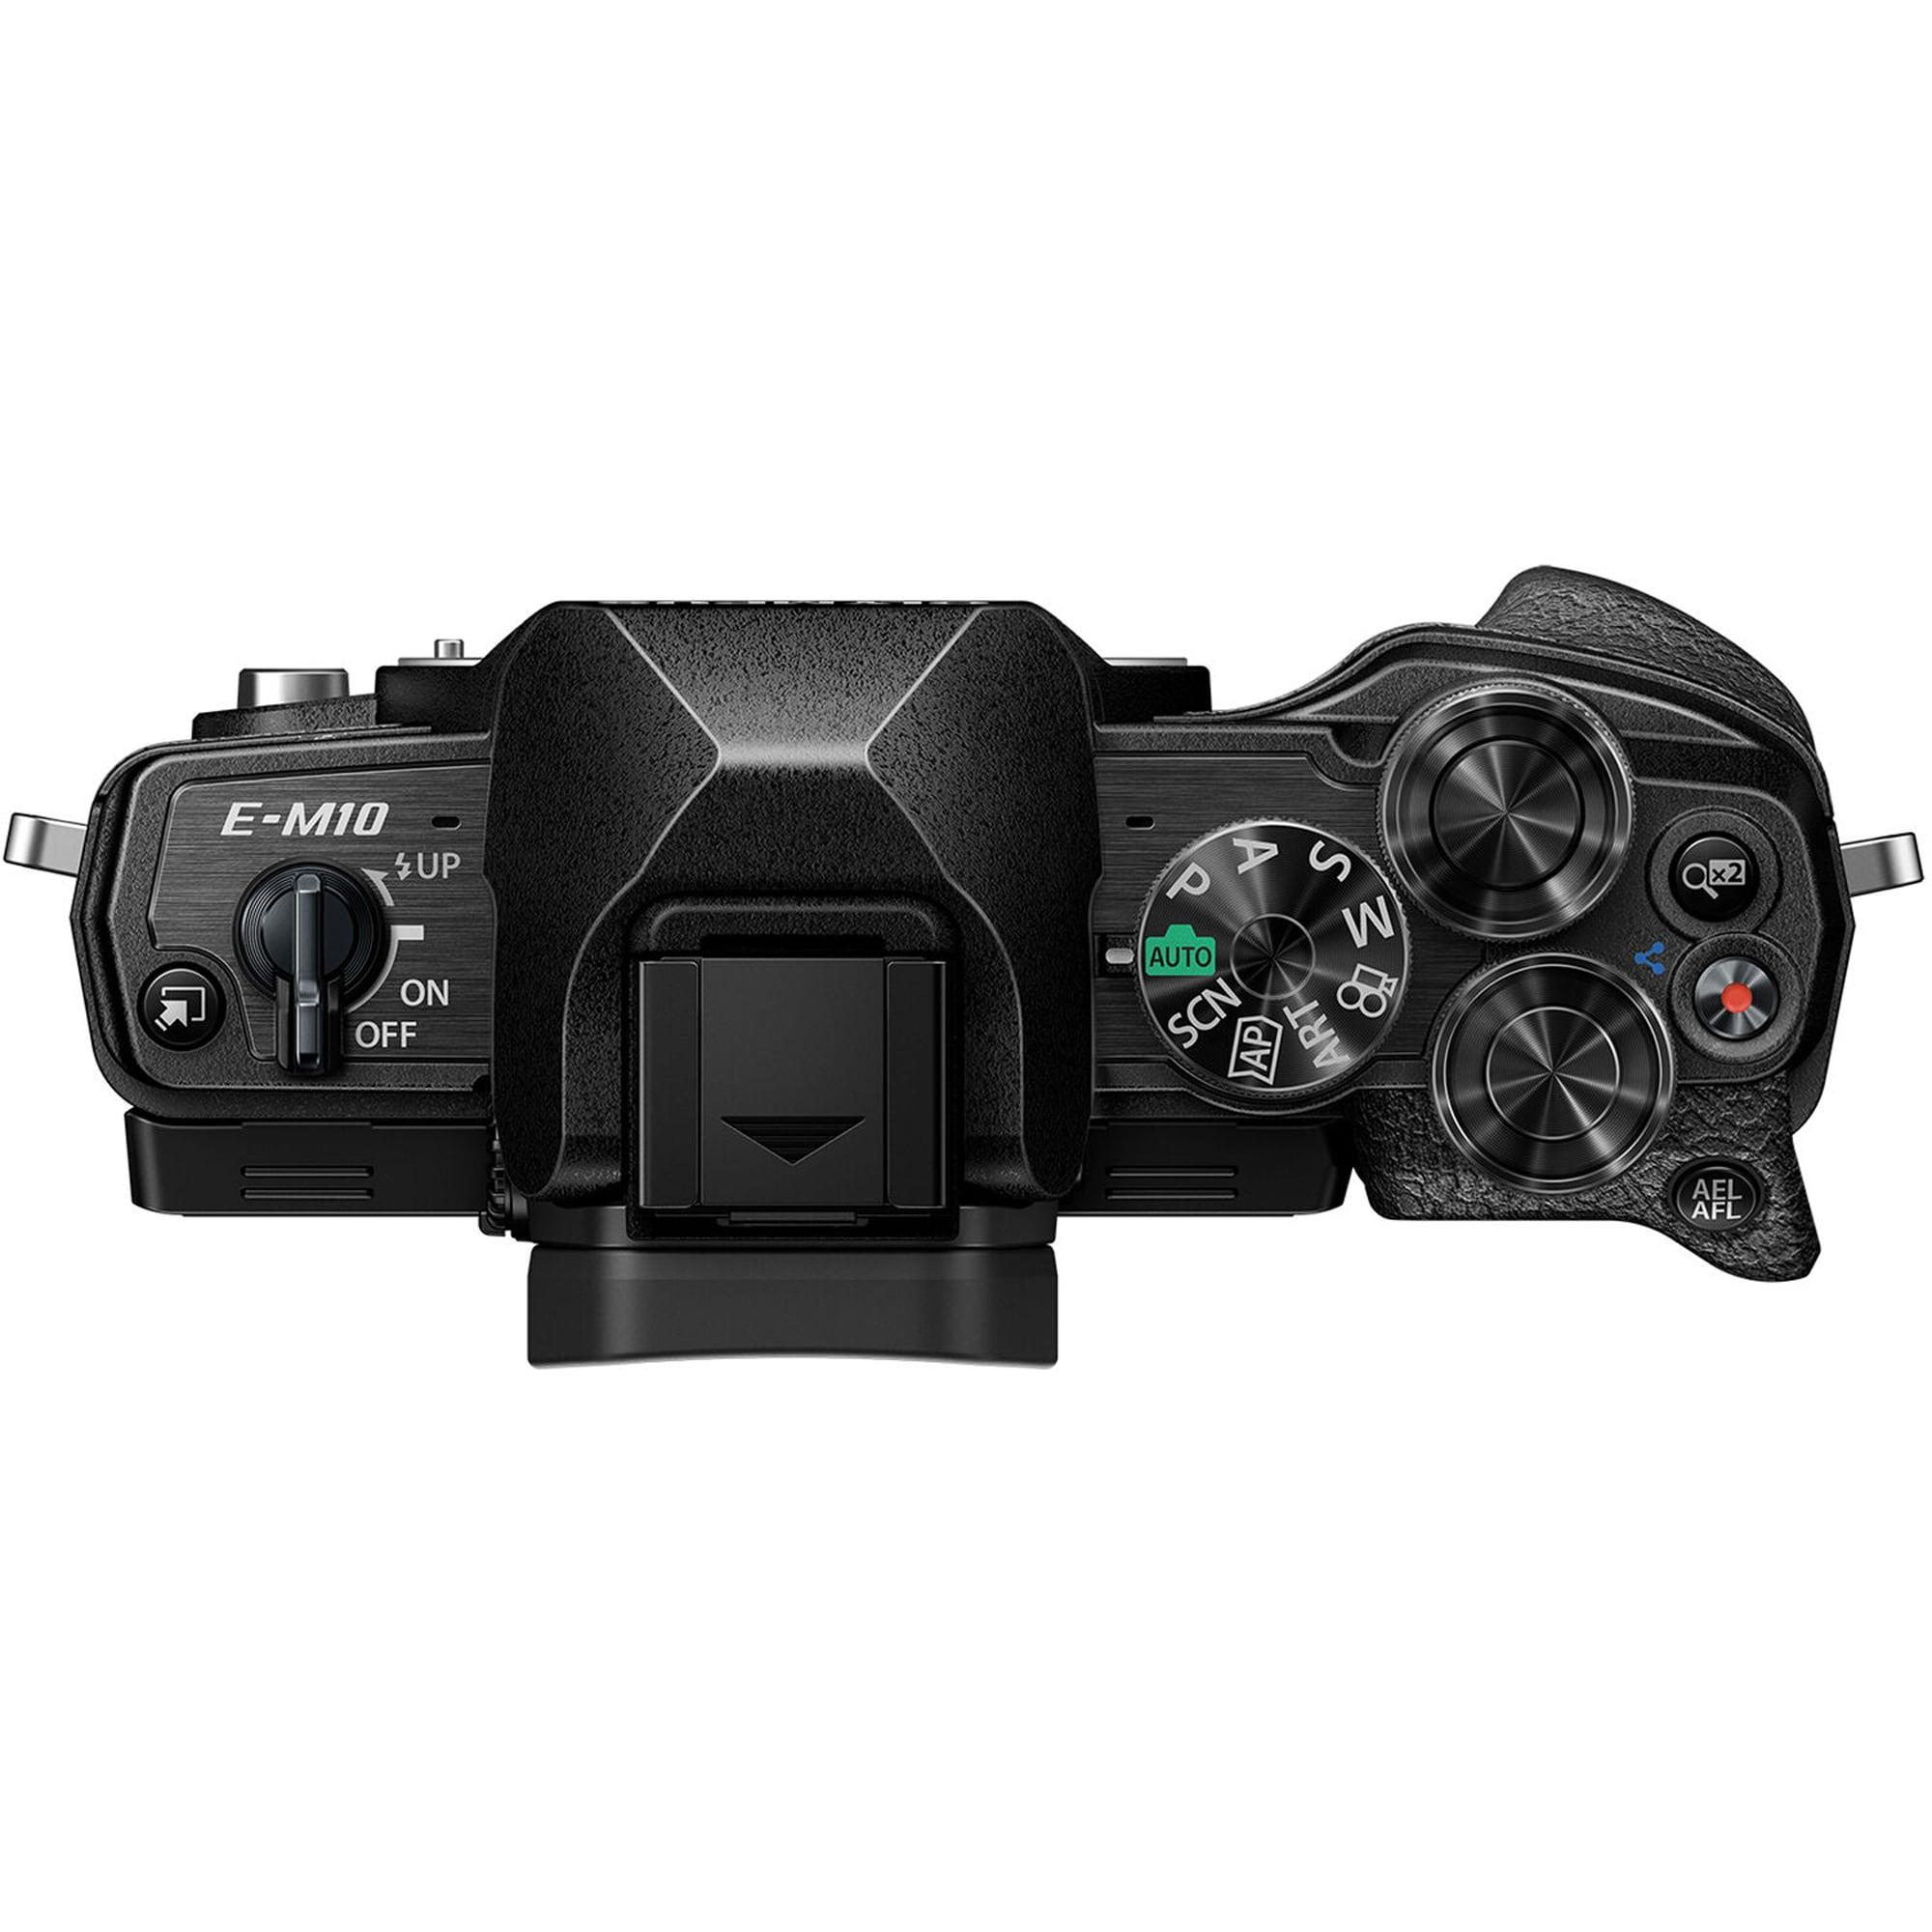 Olympus E-M10 Mark IV kamerahus svart + M.Zuiko Digital 14-42/3,5-5,6 EZ